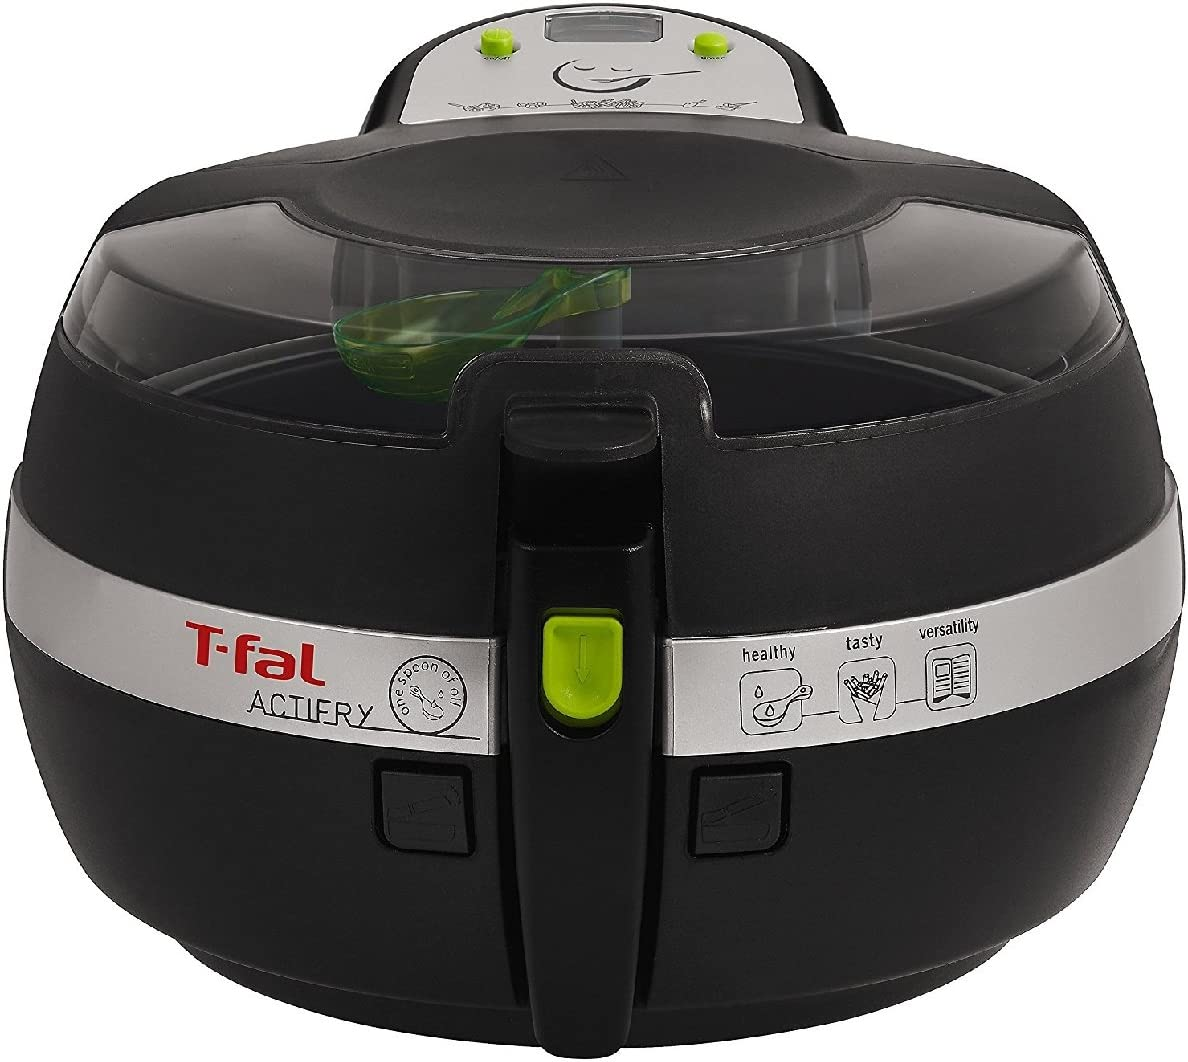 T-Fal Actifry Electric Fryer, Black